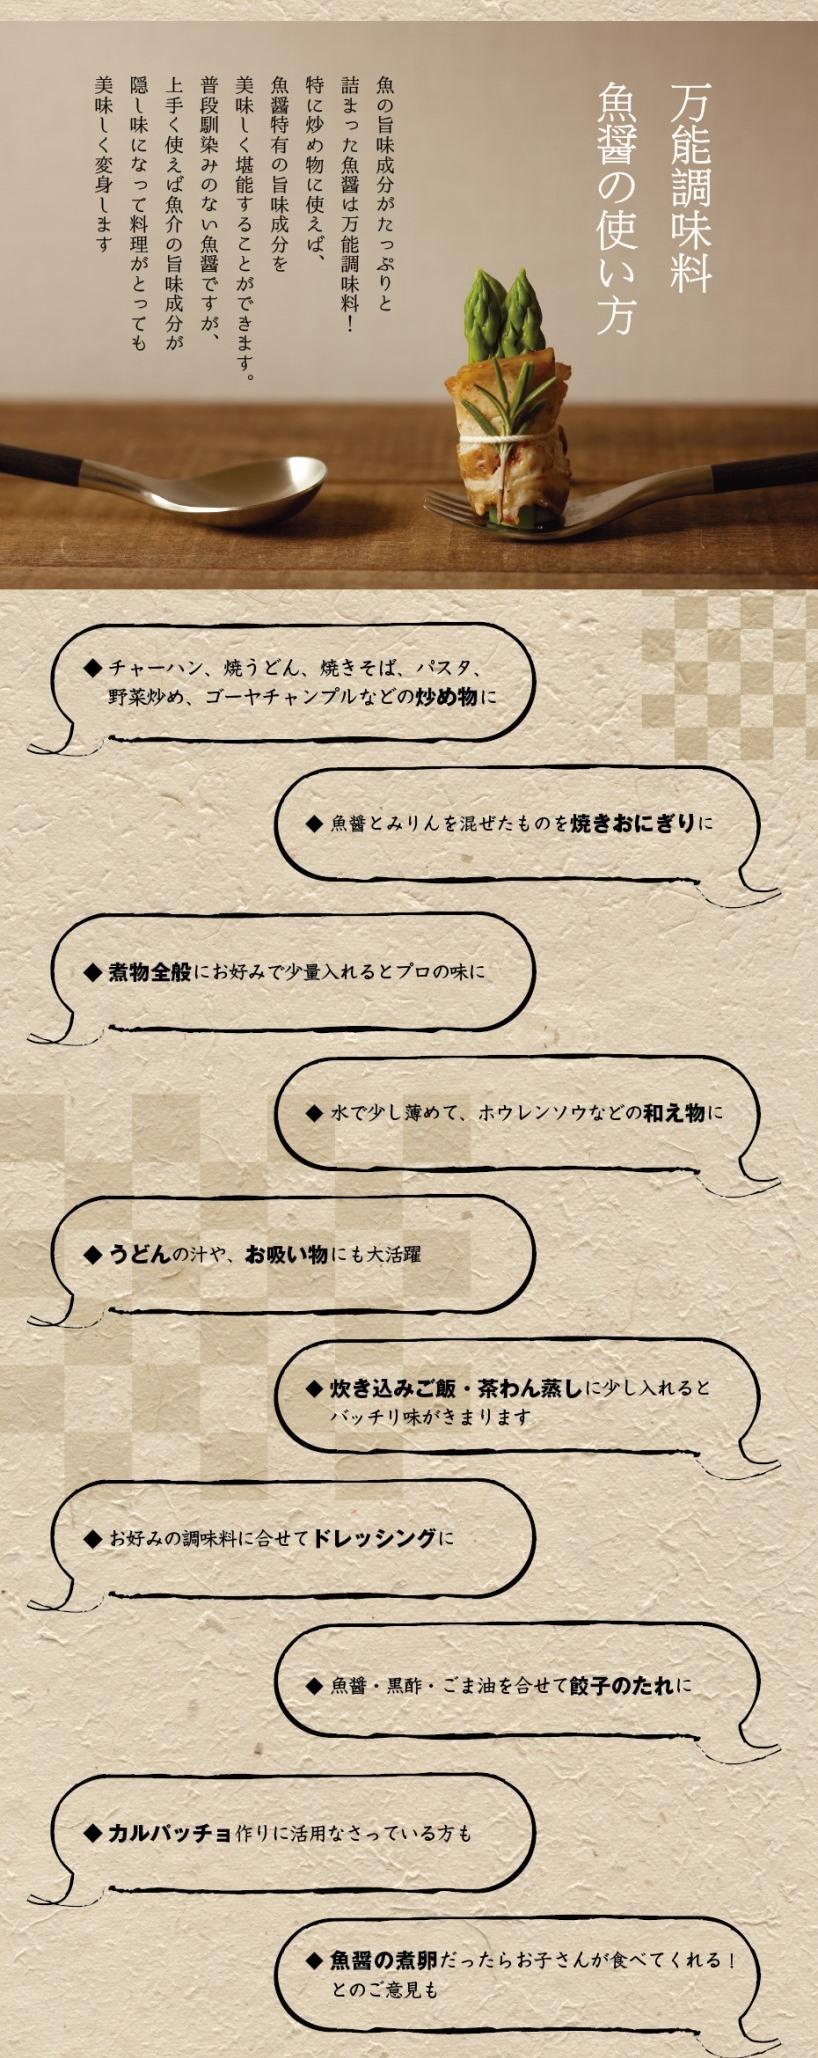 0319_gyosho-5.jpg